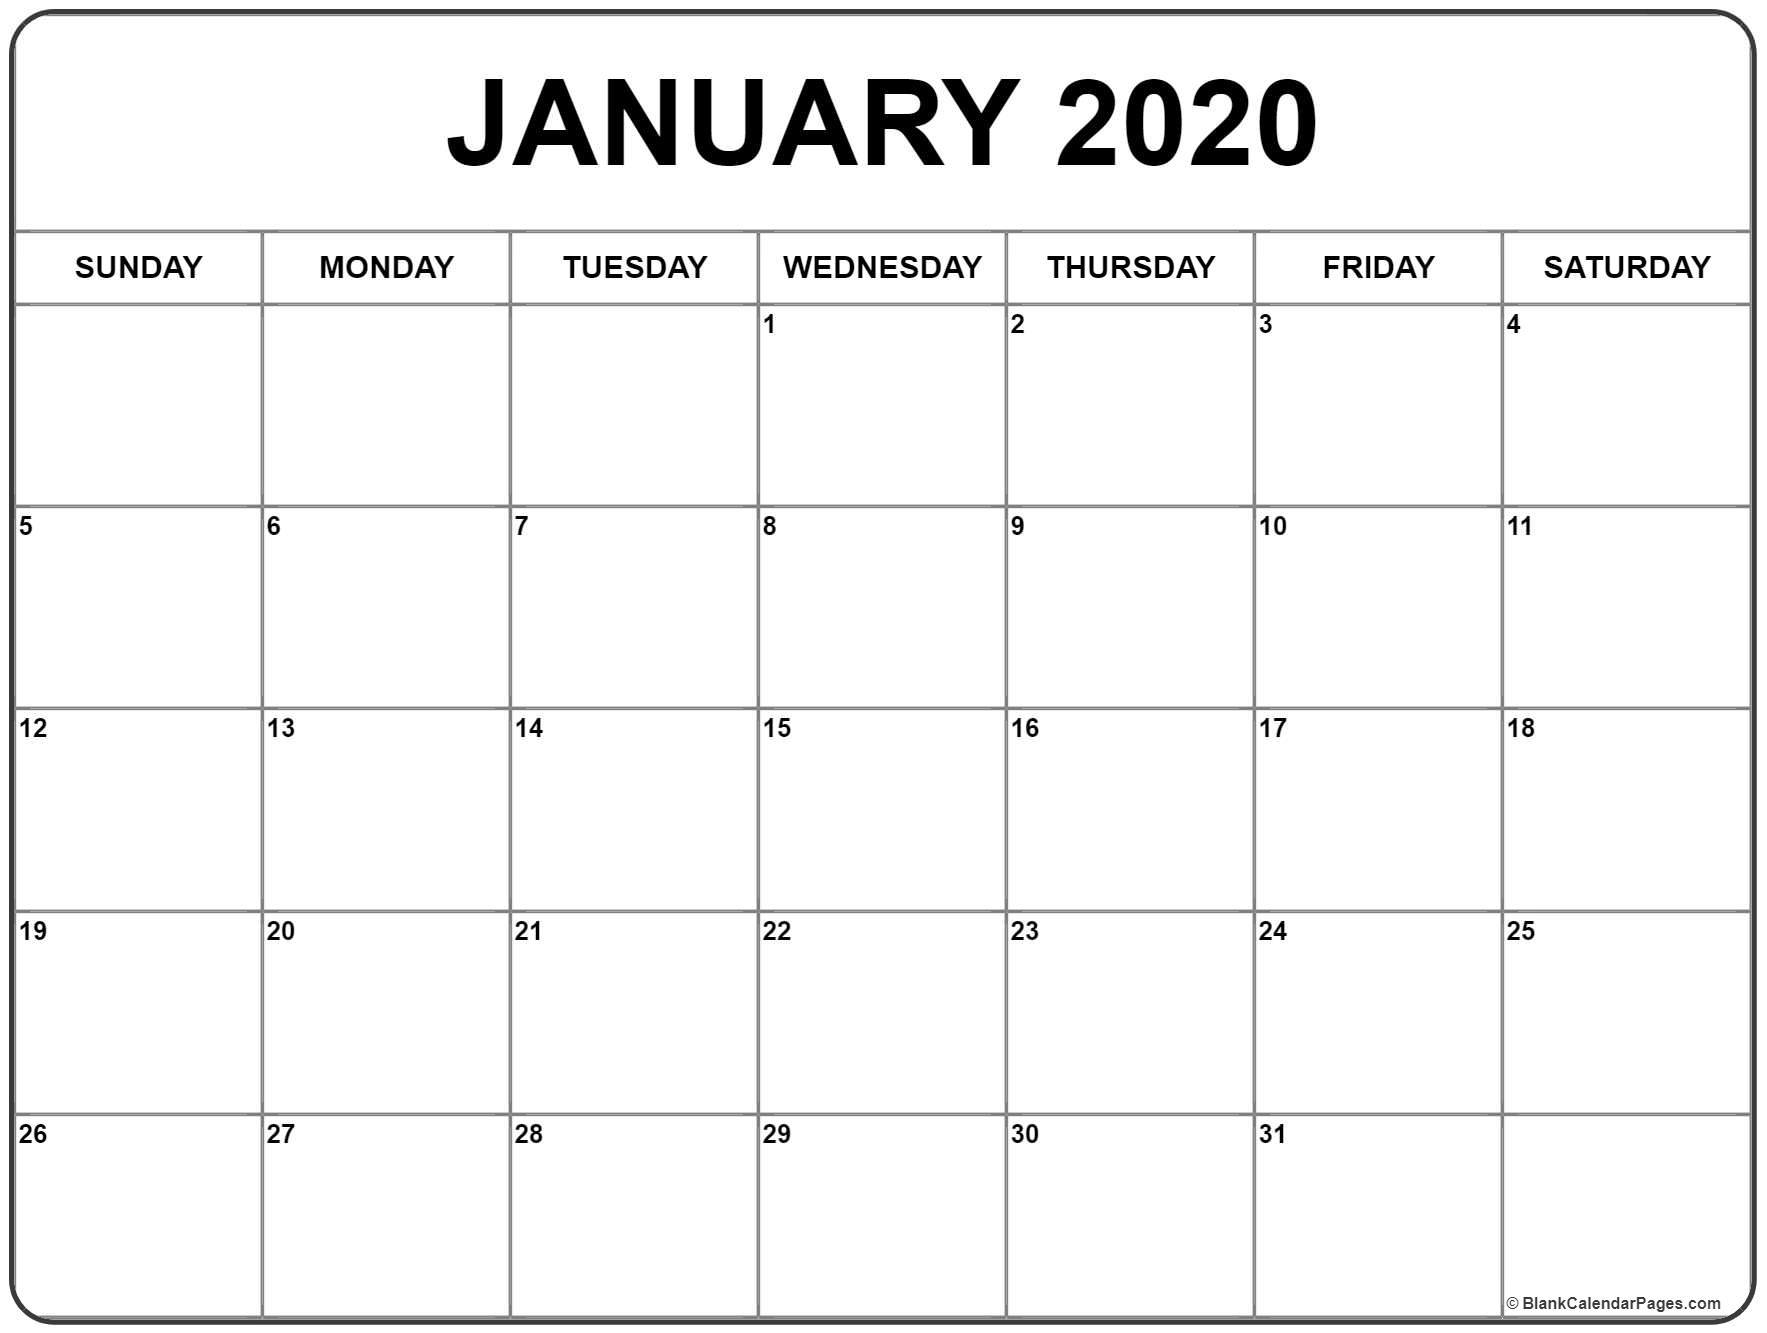 January 2020 Printable Calendar Monthly Editable Template